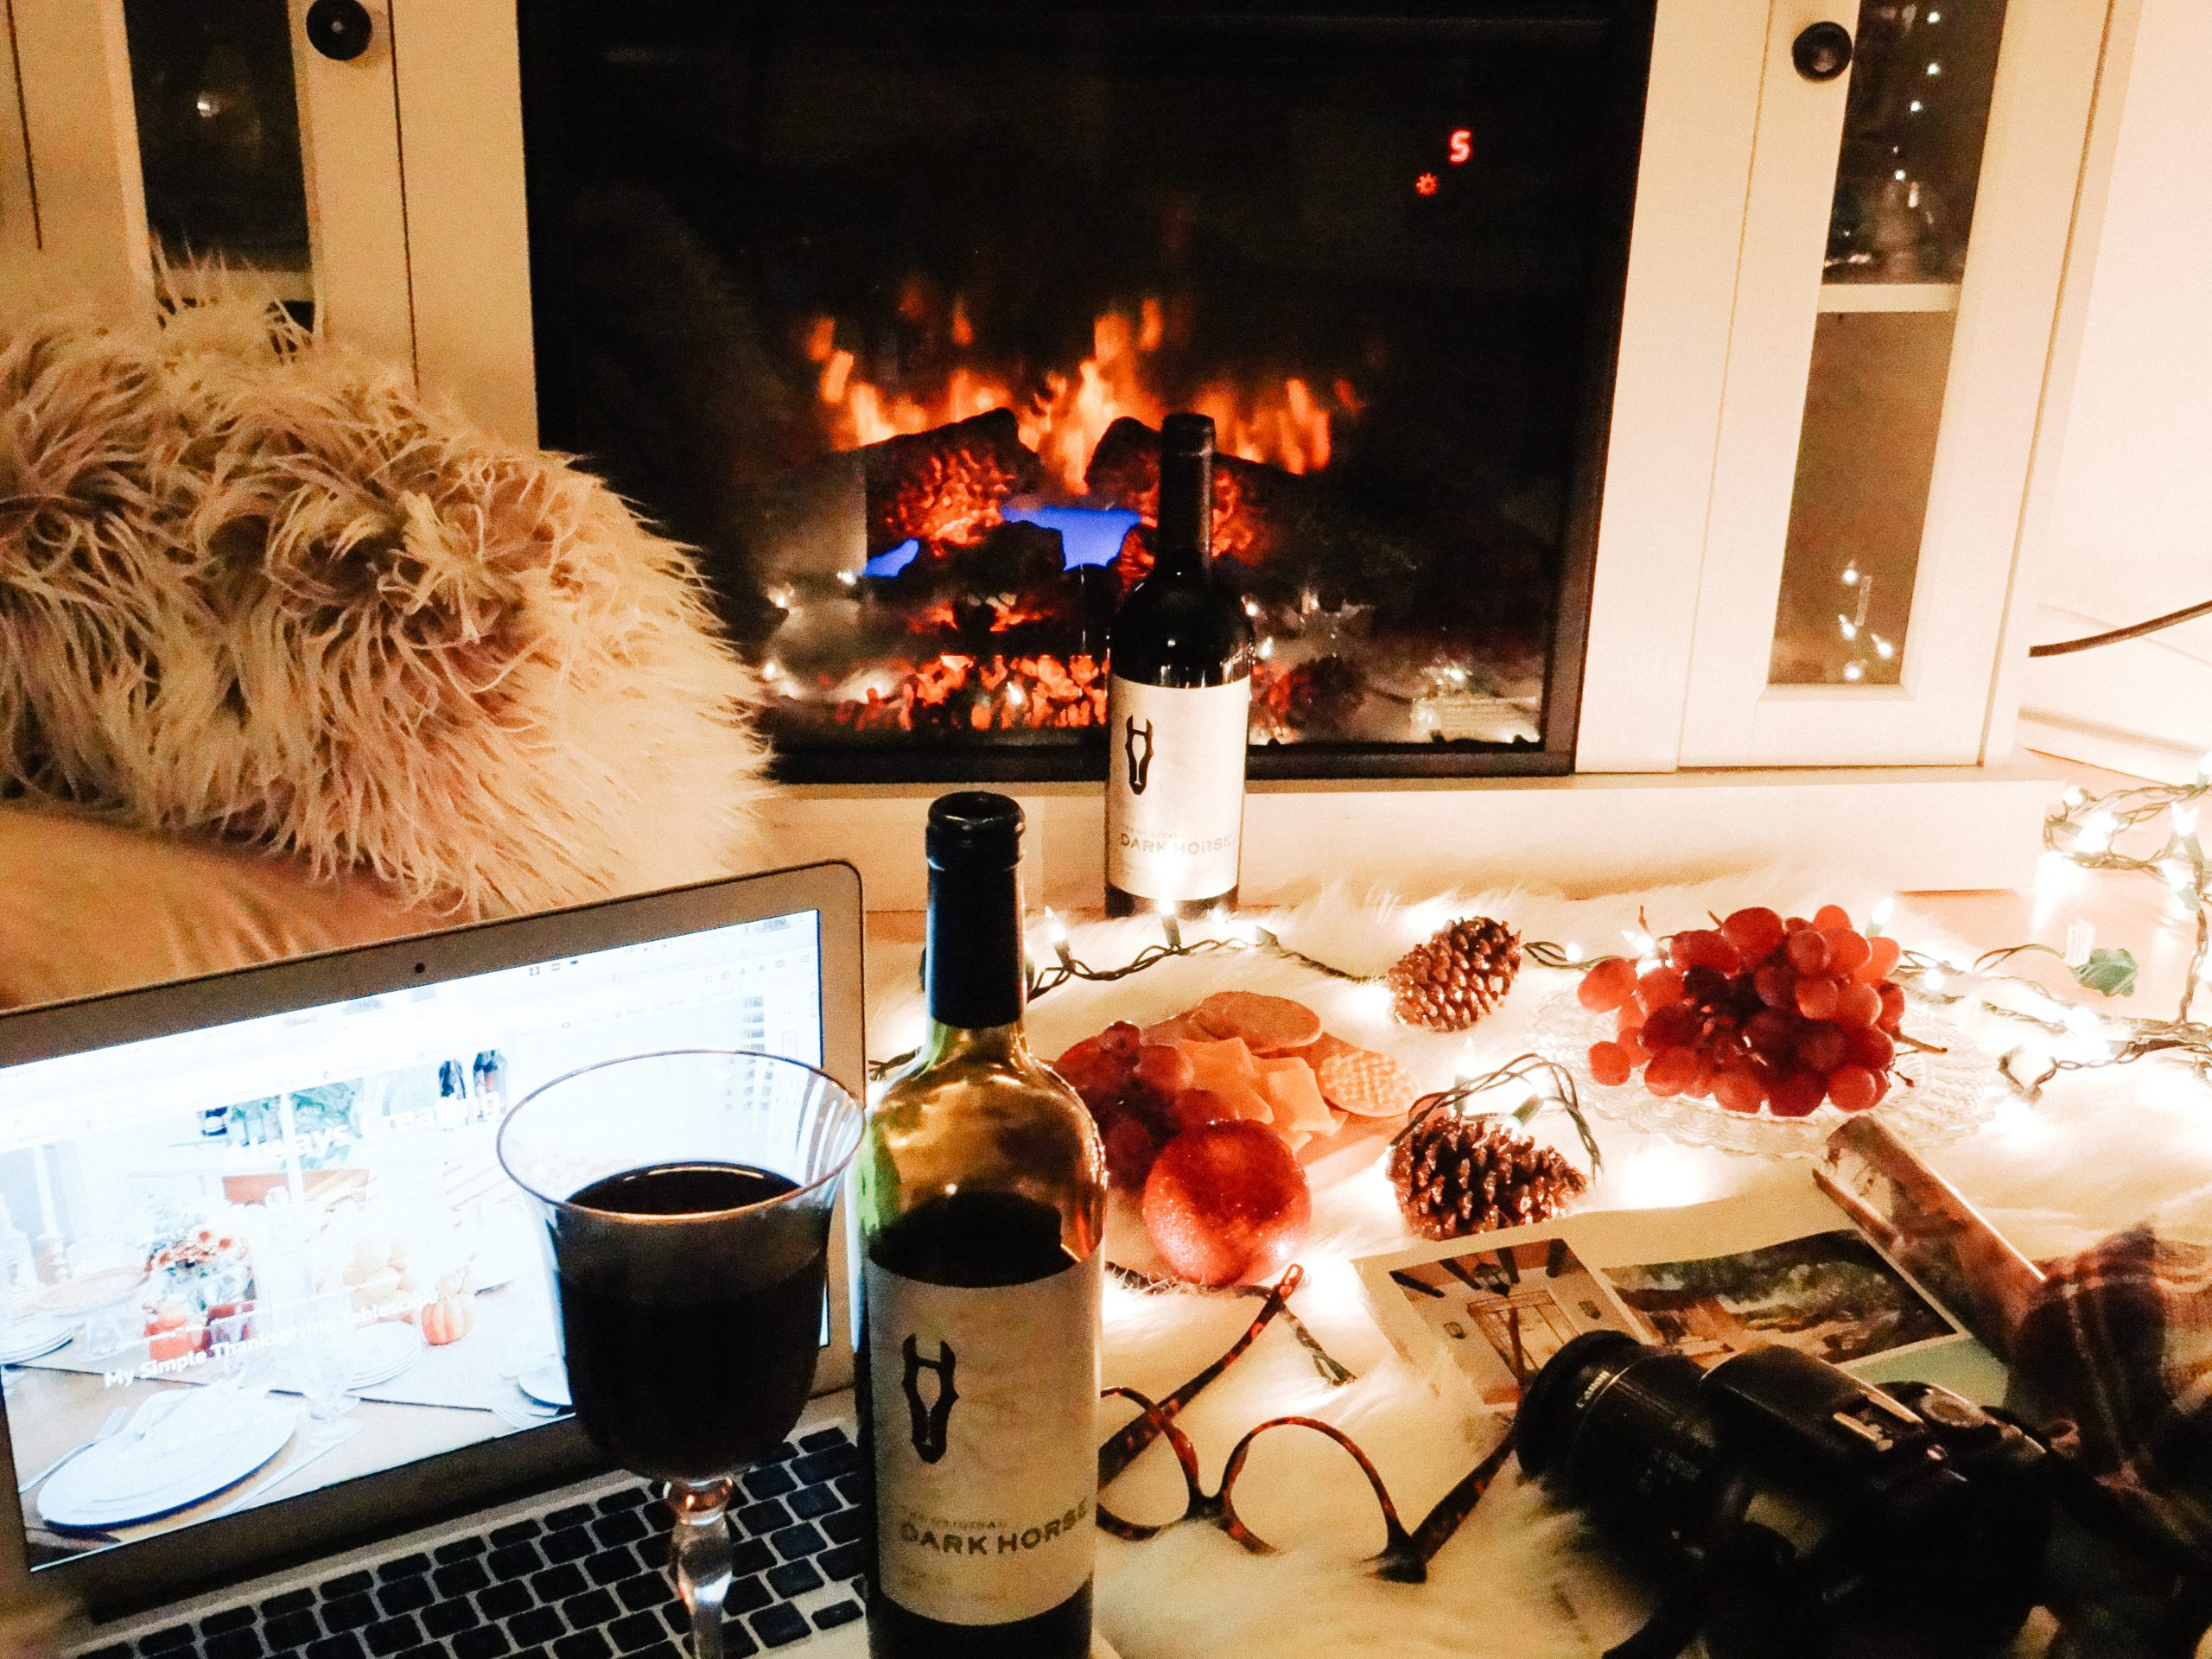 {Always Creating Blog // Dark Horse Wine x Always Creating Blog}